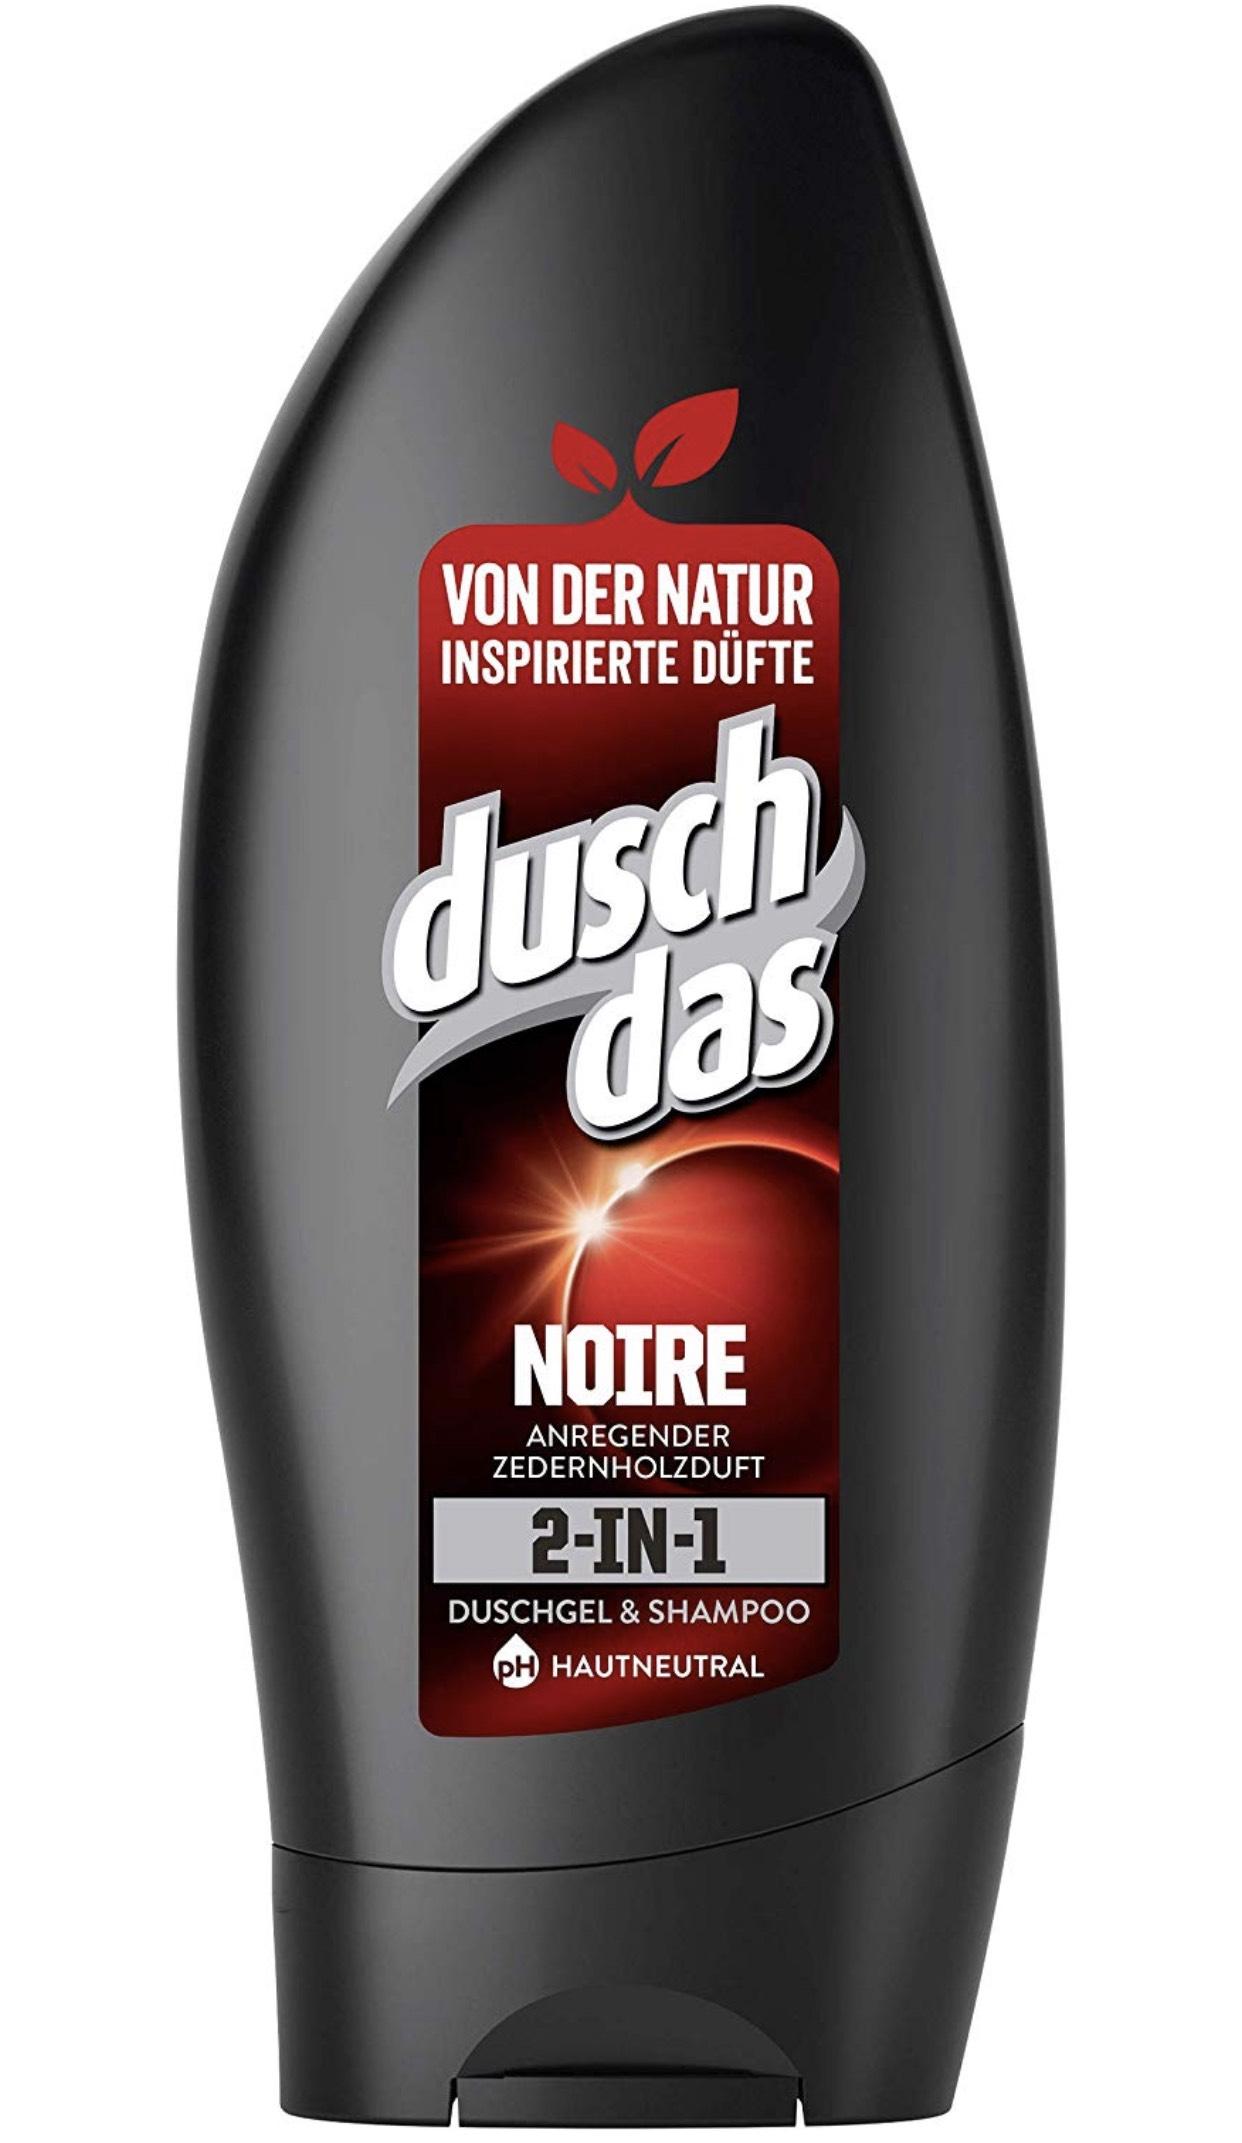 Duschdas For Men Duschgel Noire, 6er Pack im Spar-Abo